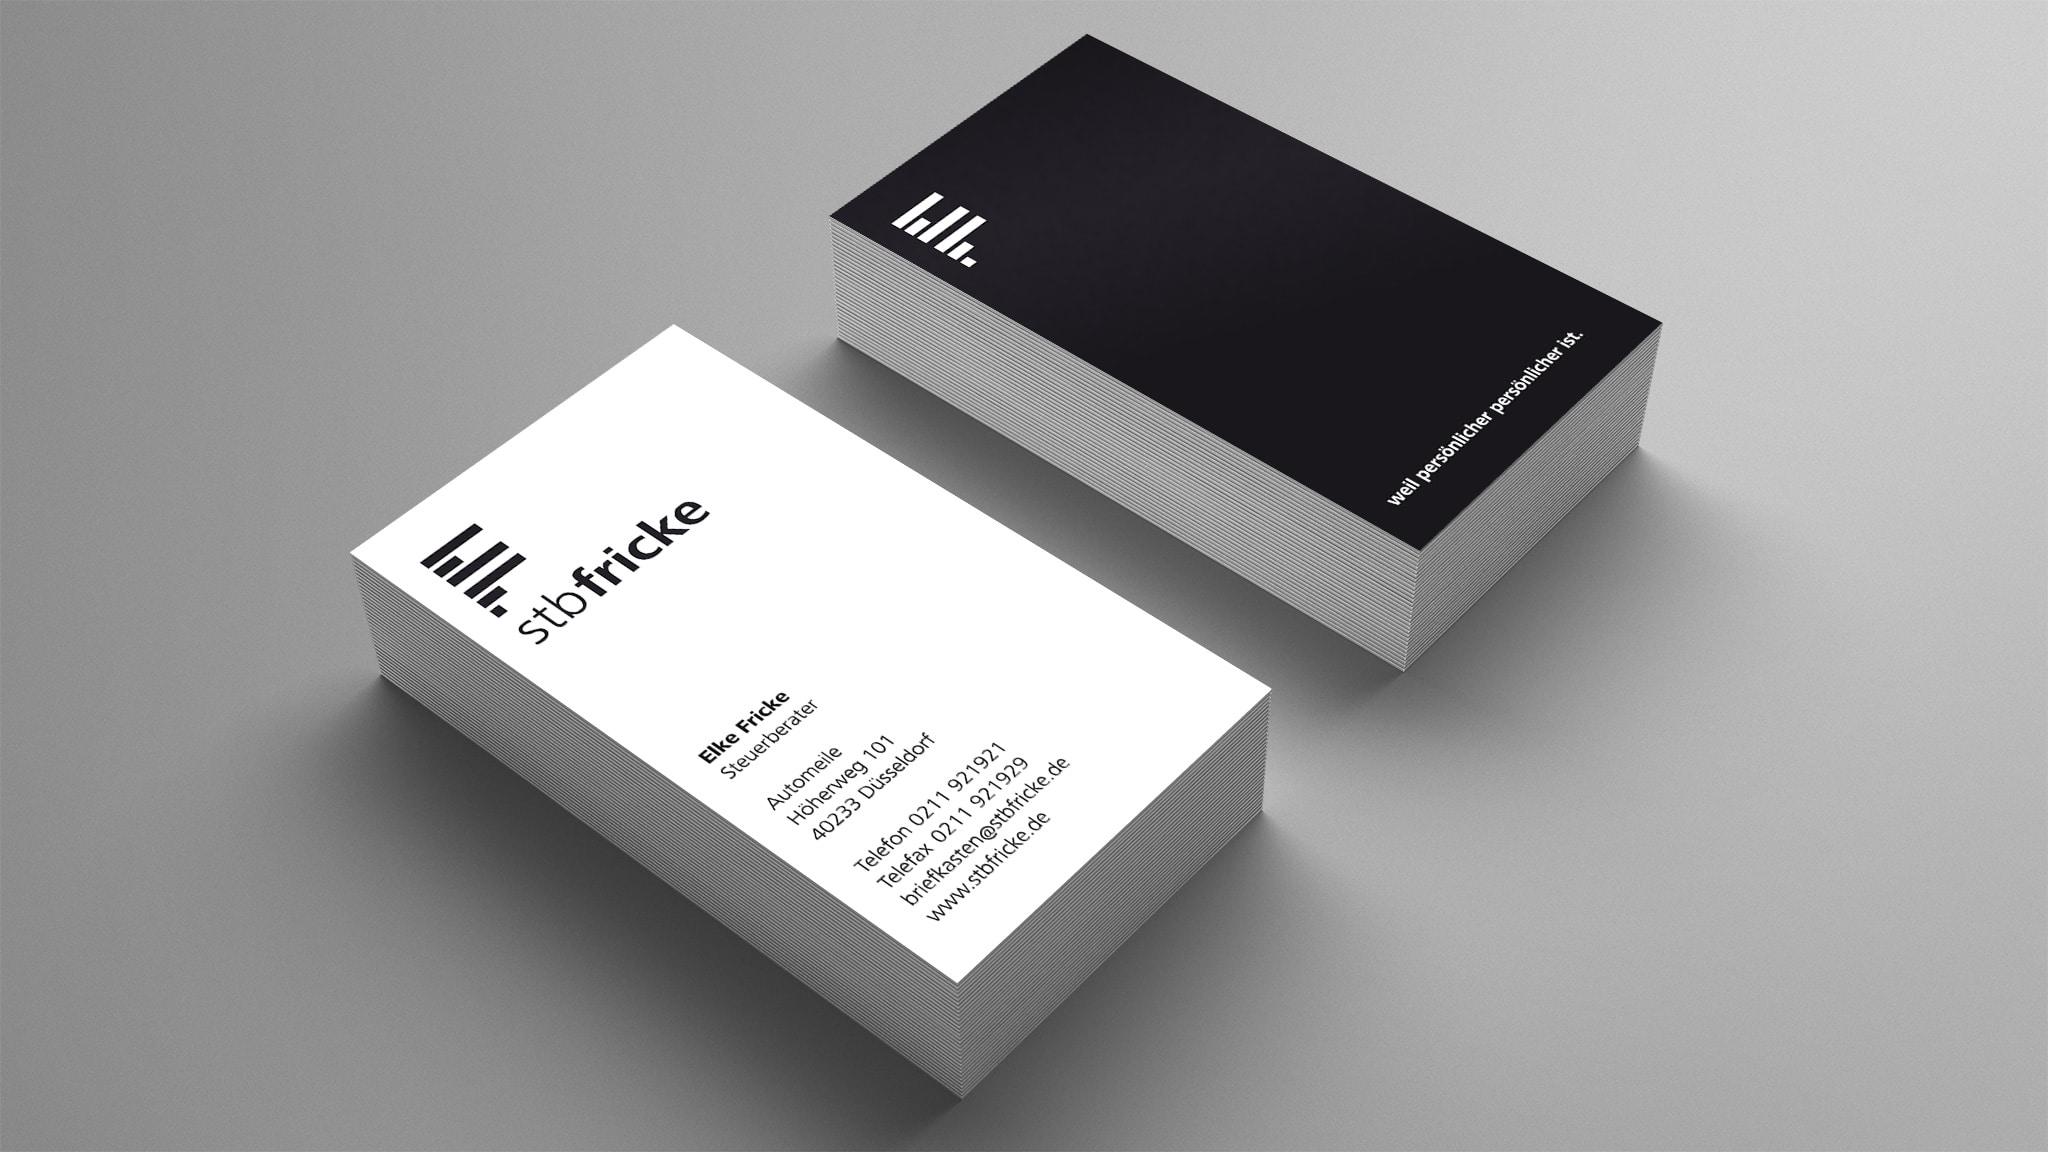 11_Stb-Fricke-Corporate-Design-4